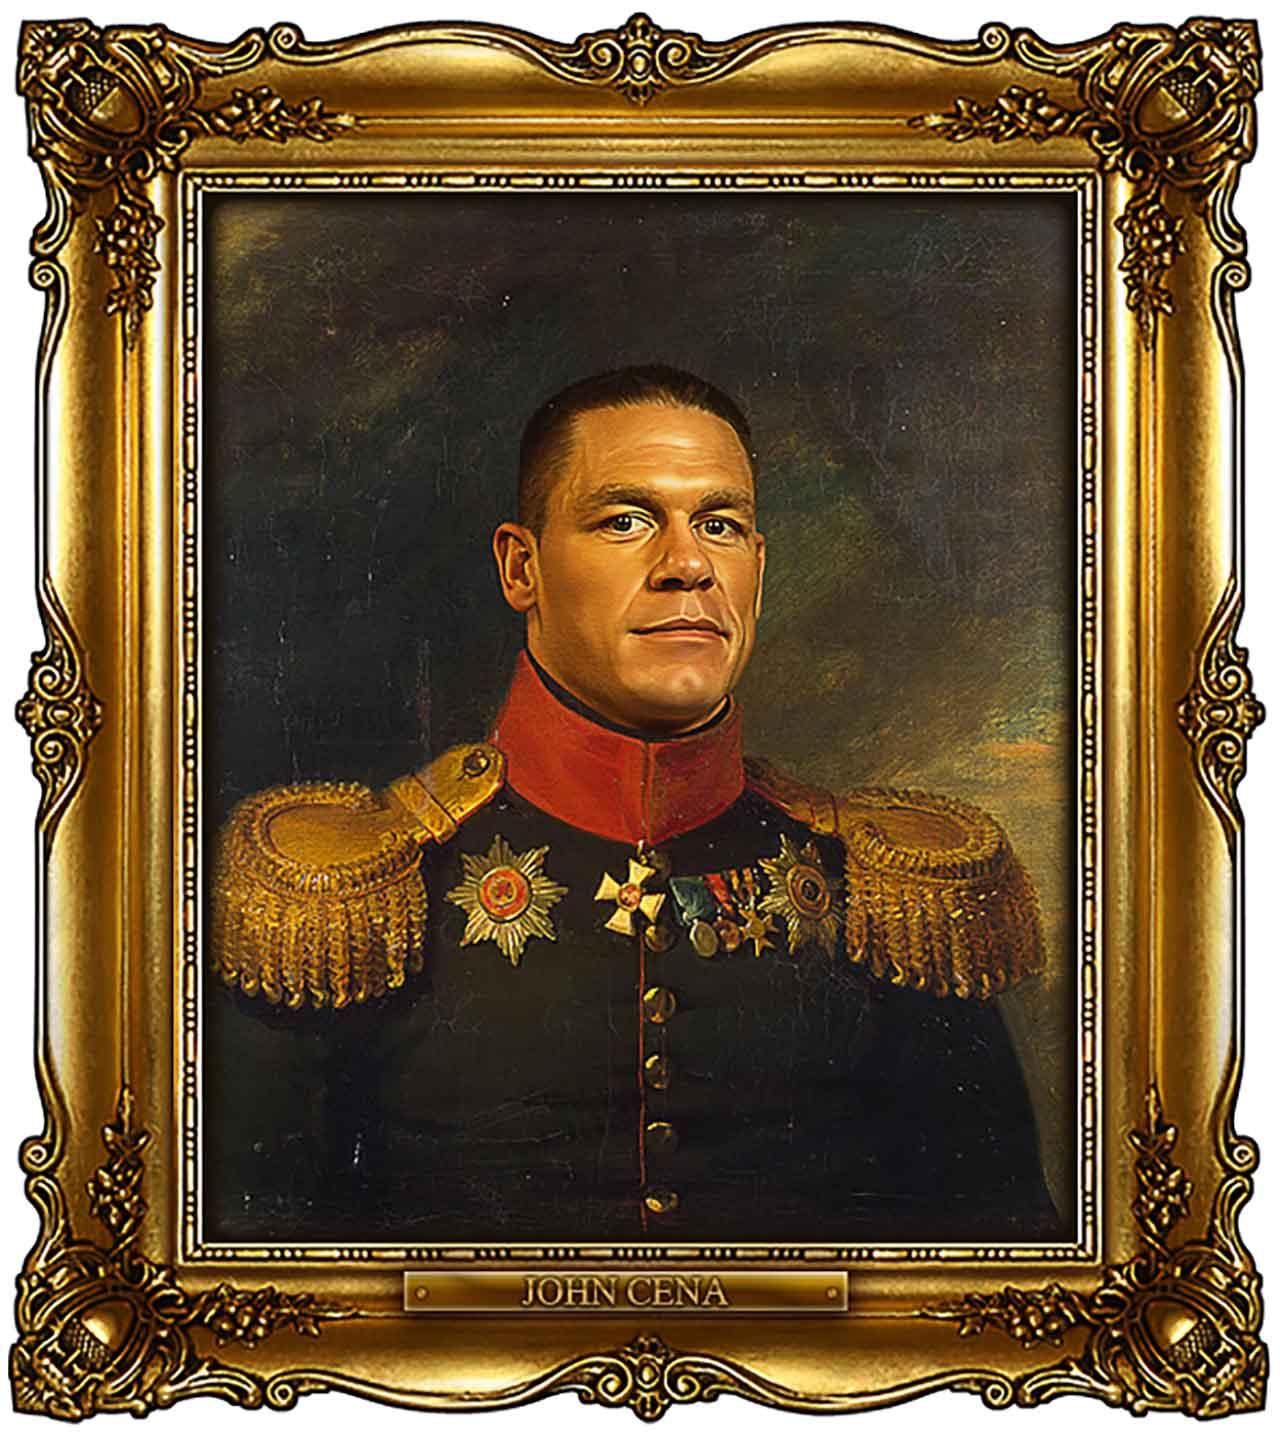 Artist Turns Famous Actors Into Russian Generals - John Cena